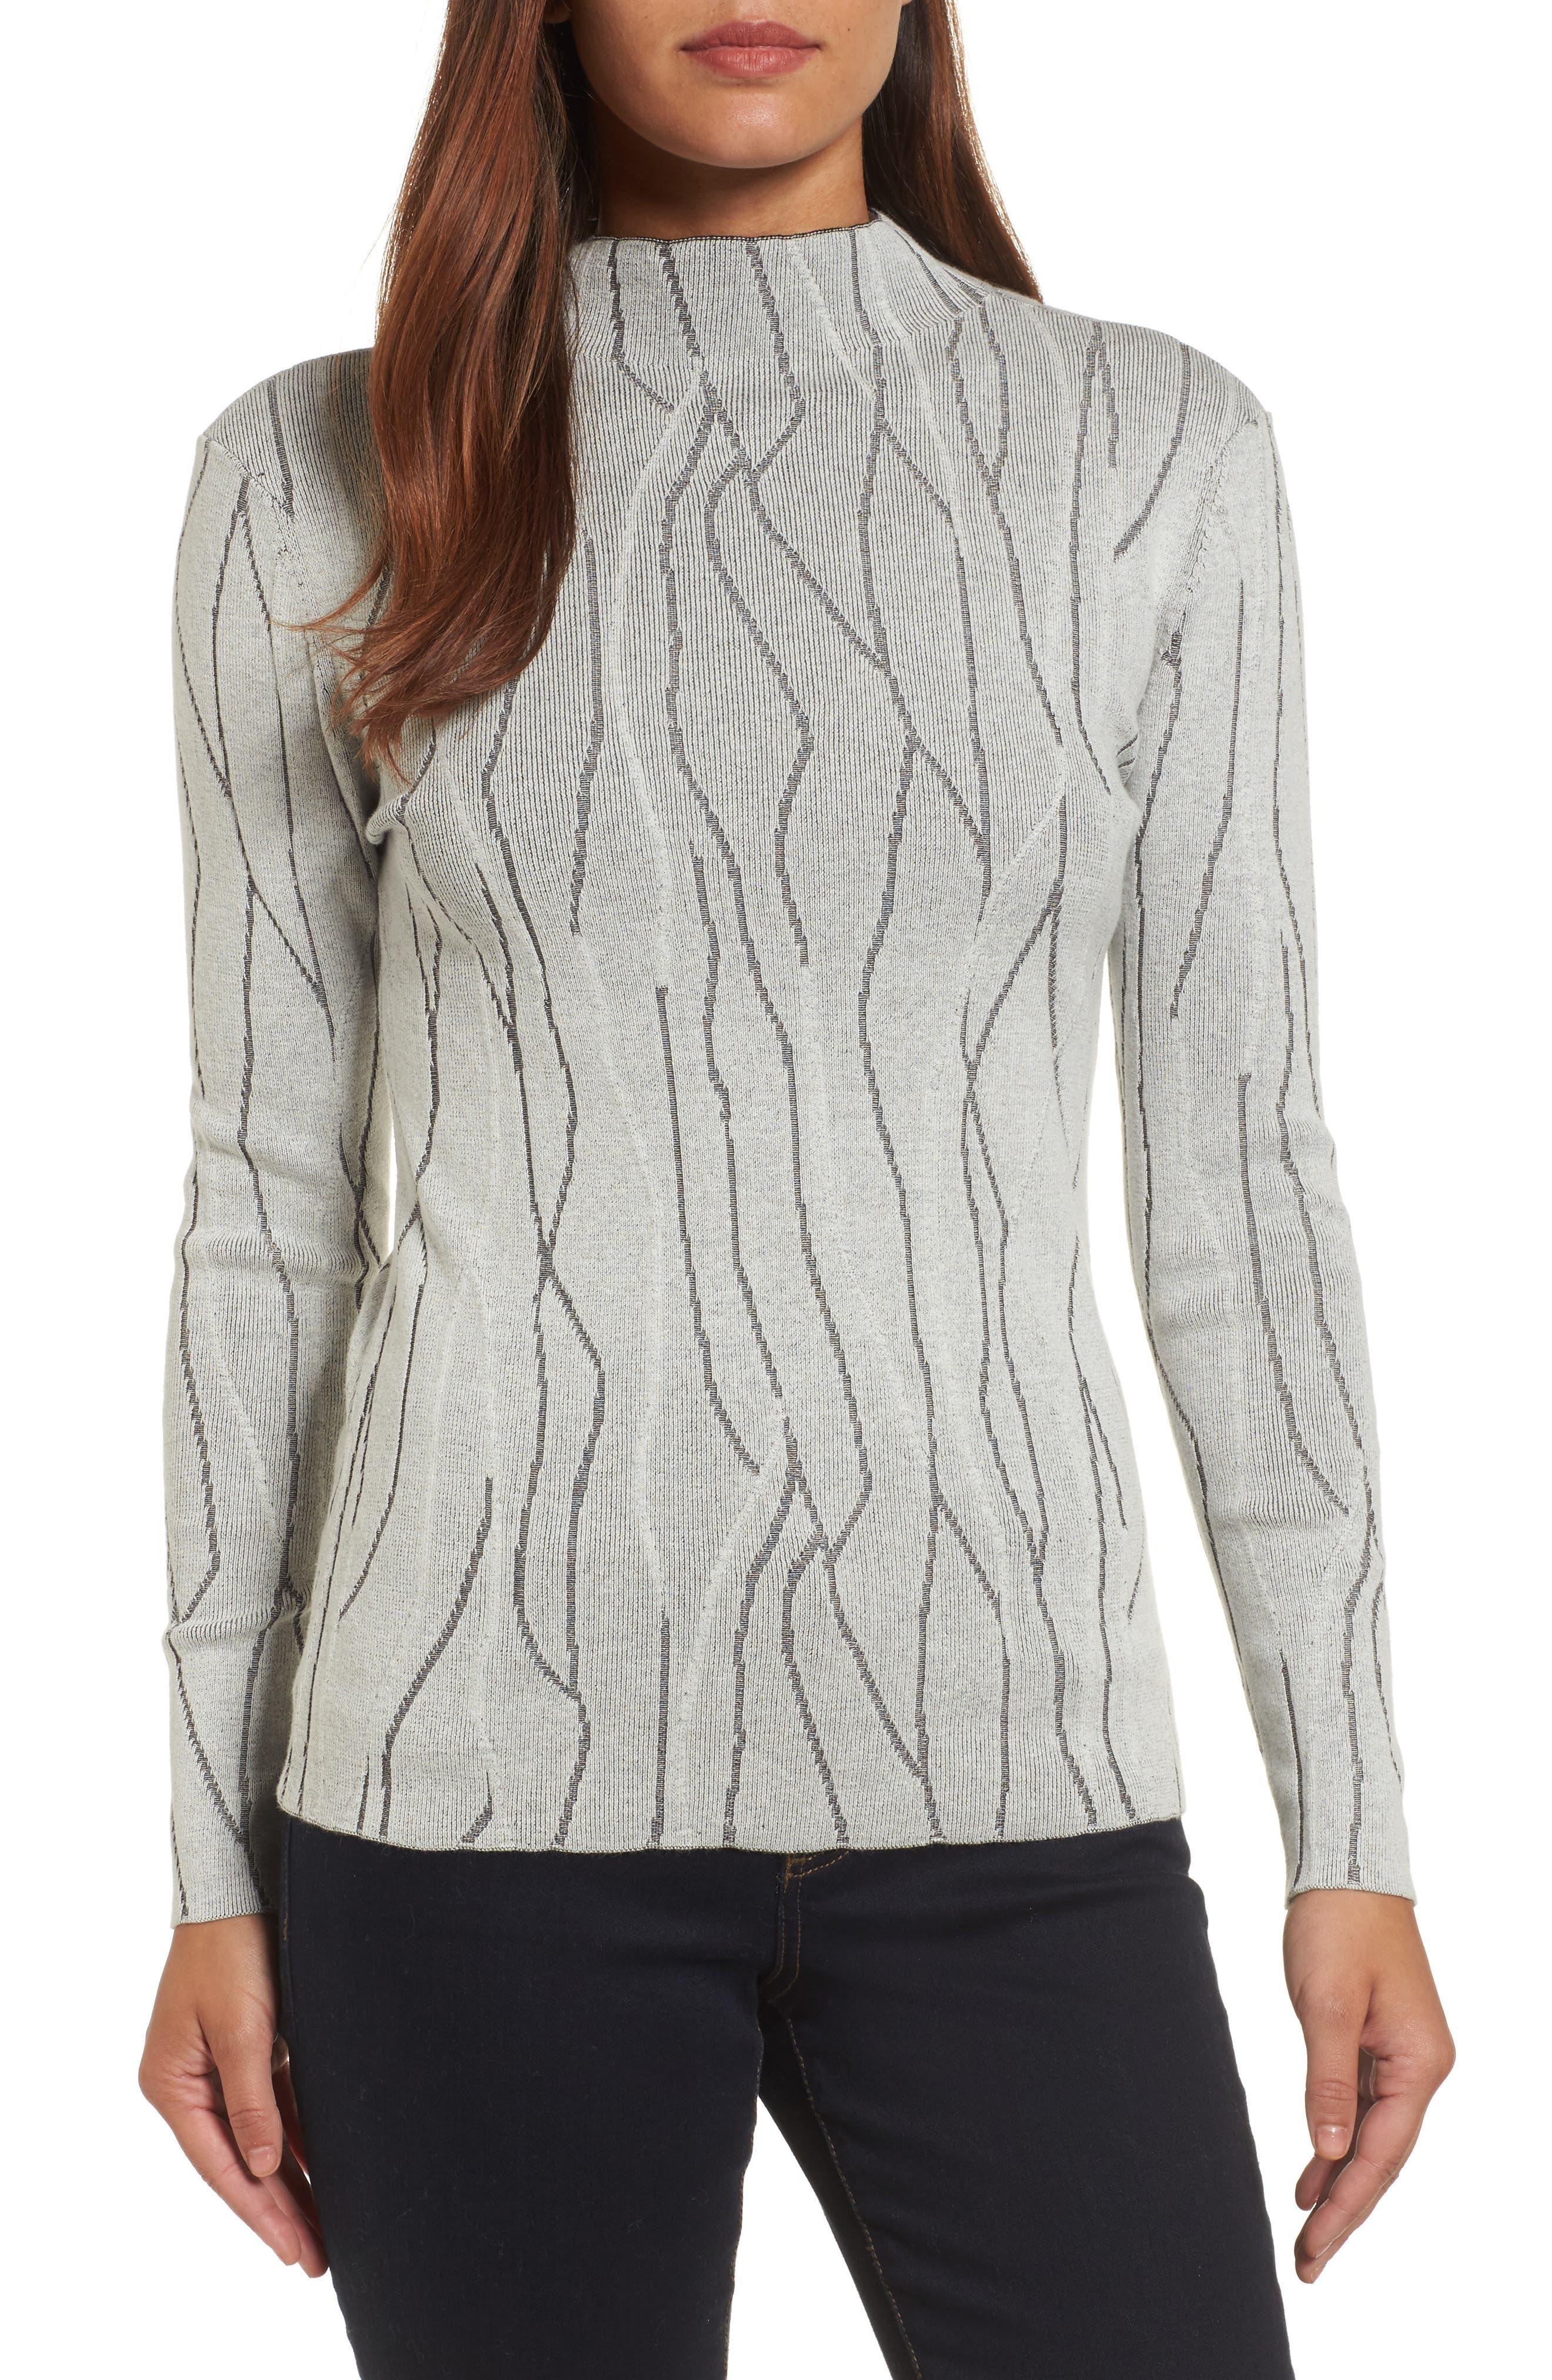 NIC+ZOE Artisanal Crackle Jacquard Sweater (Regular & Petite)